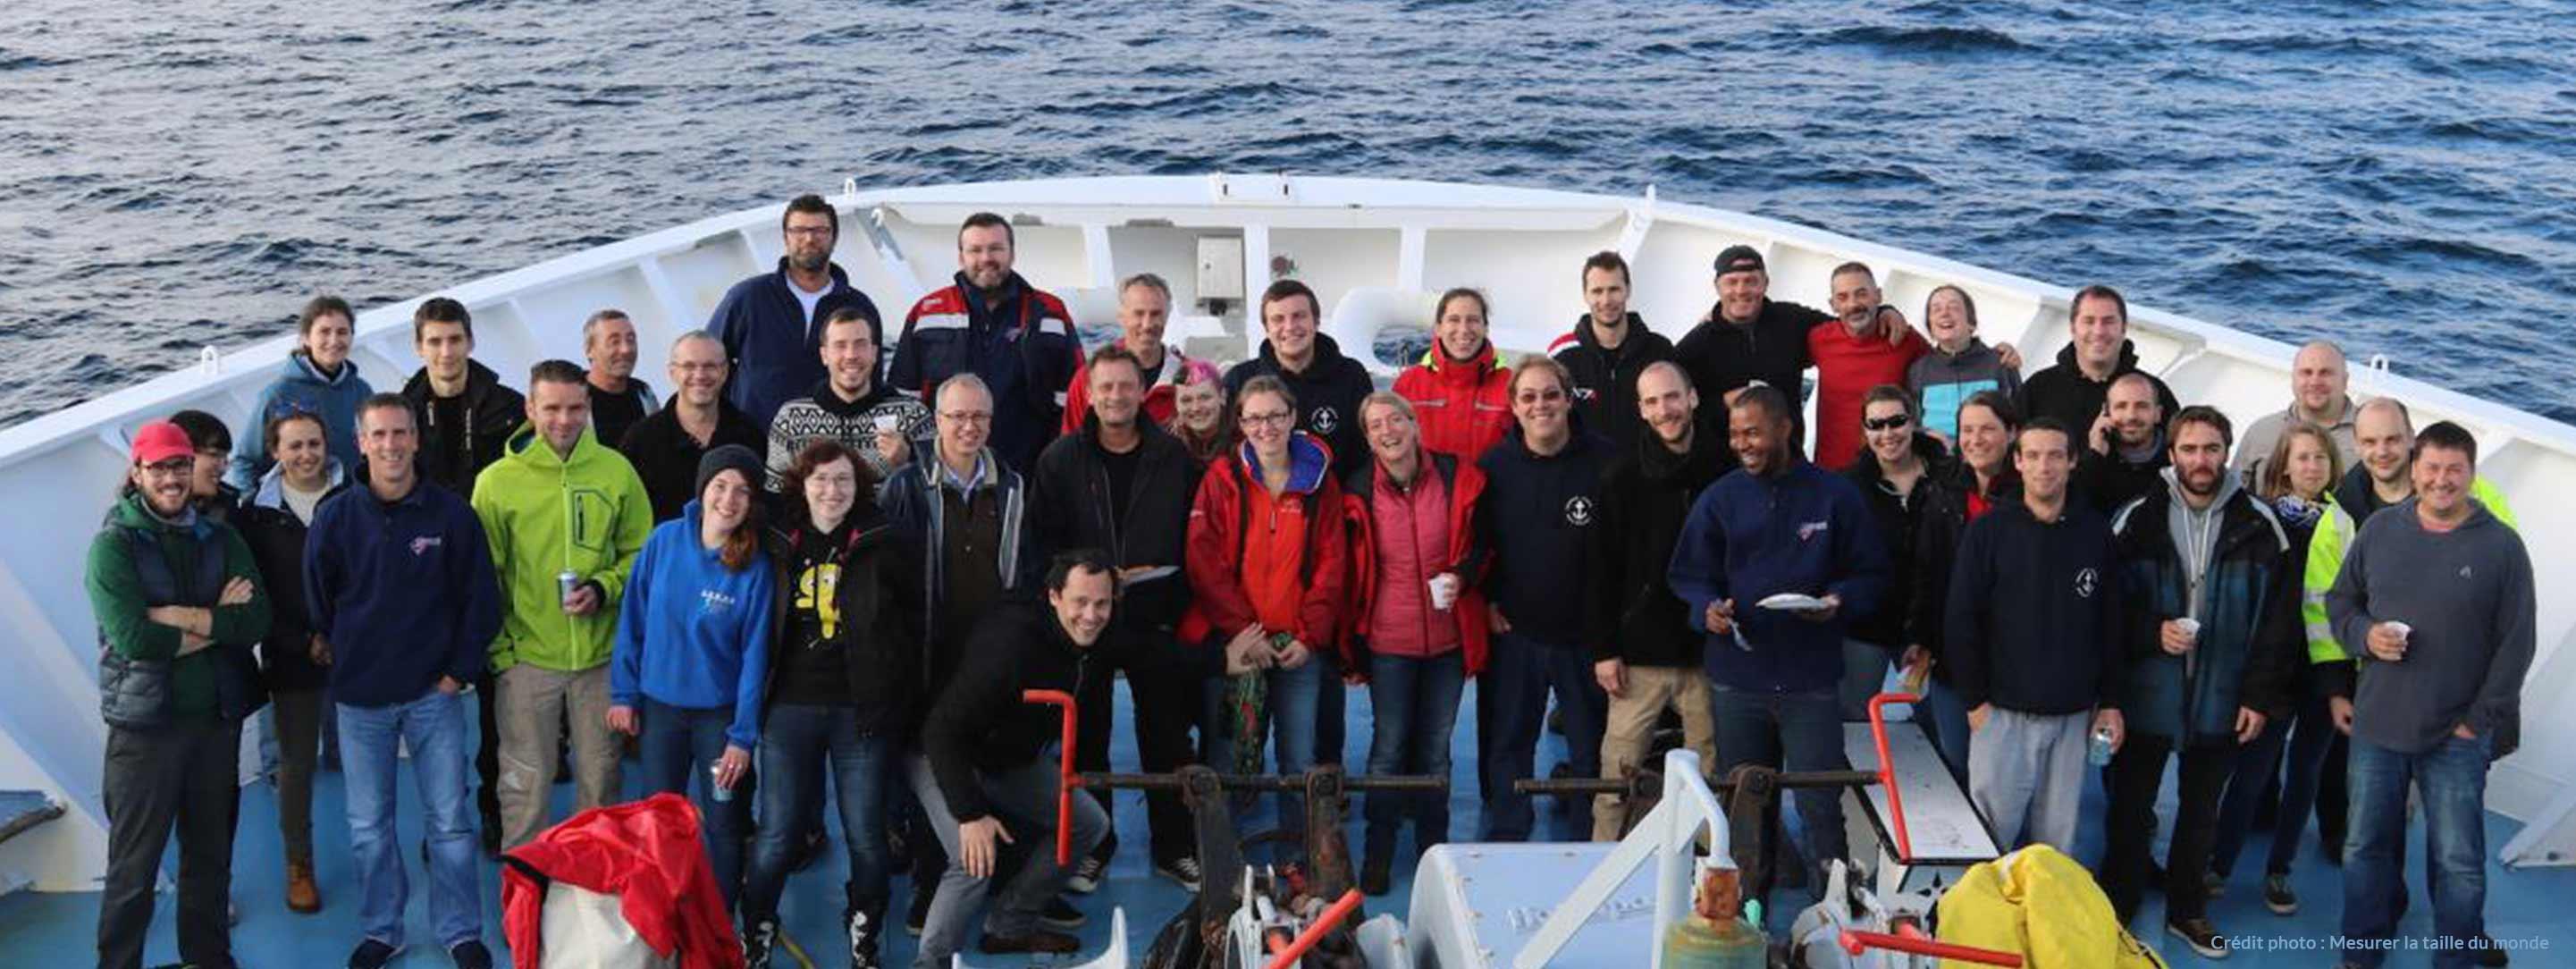 Équipe scientifique Mission Mingulay-Rockall